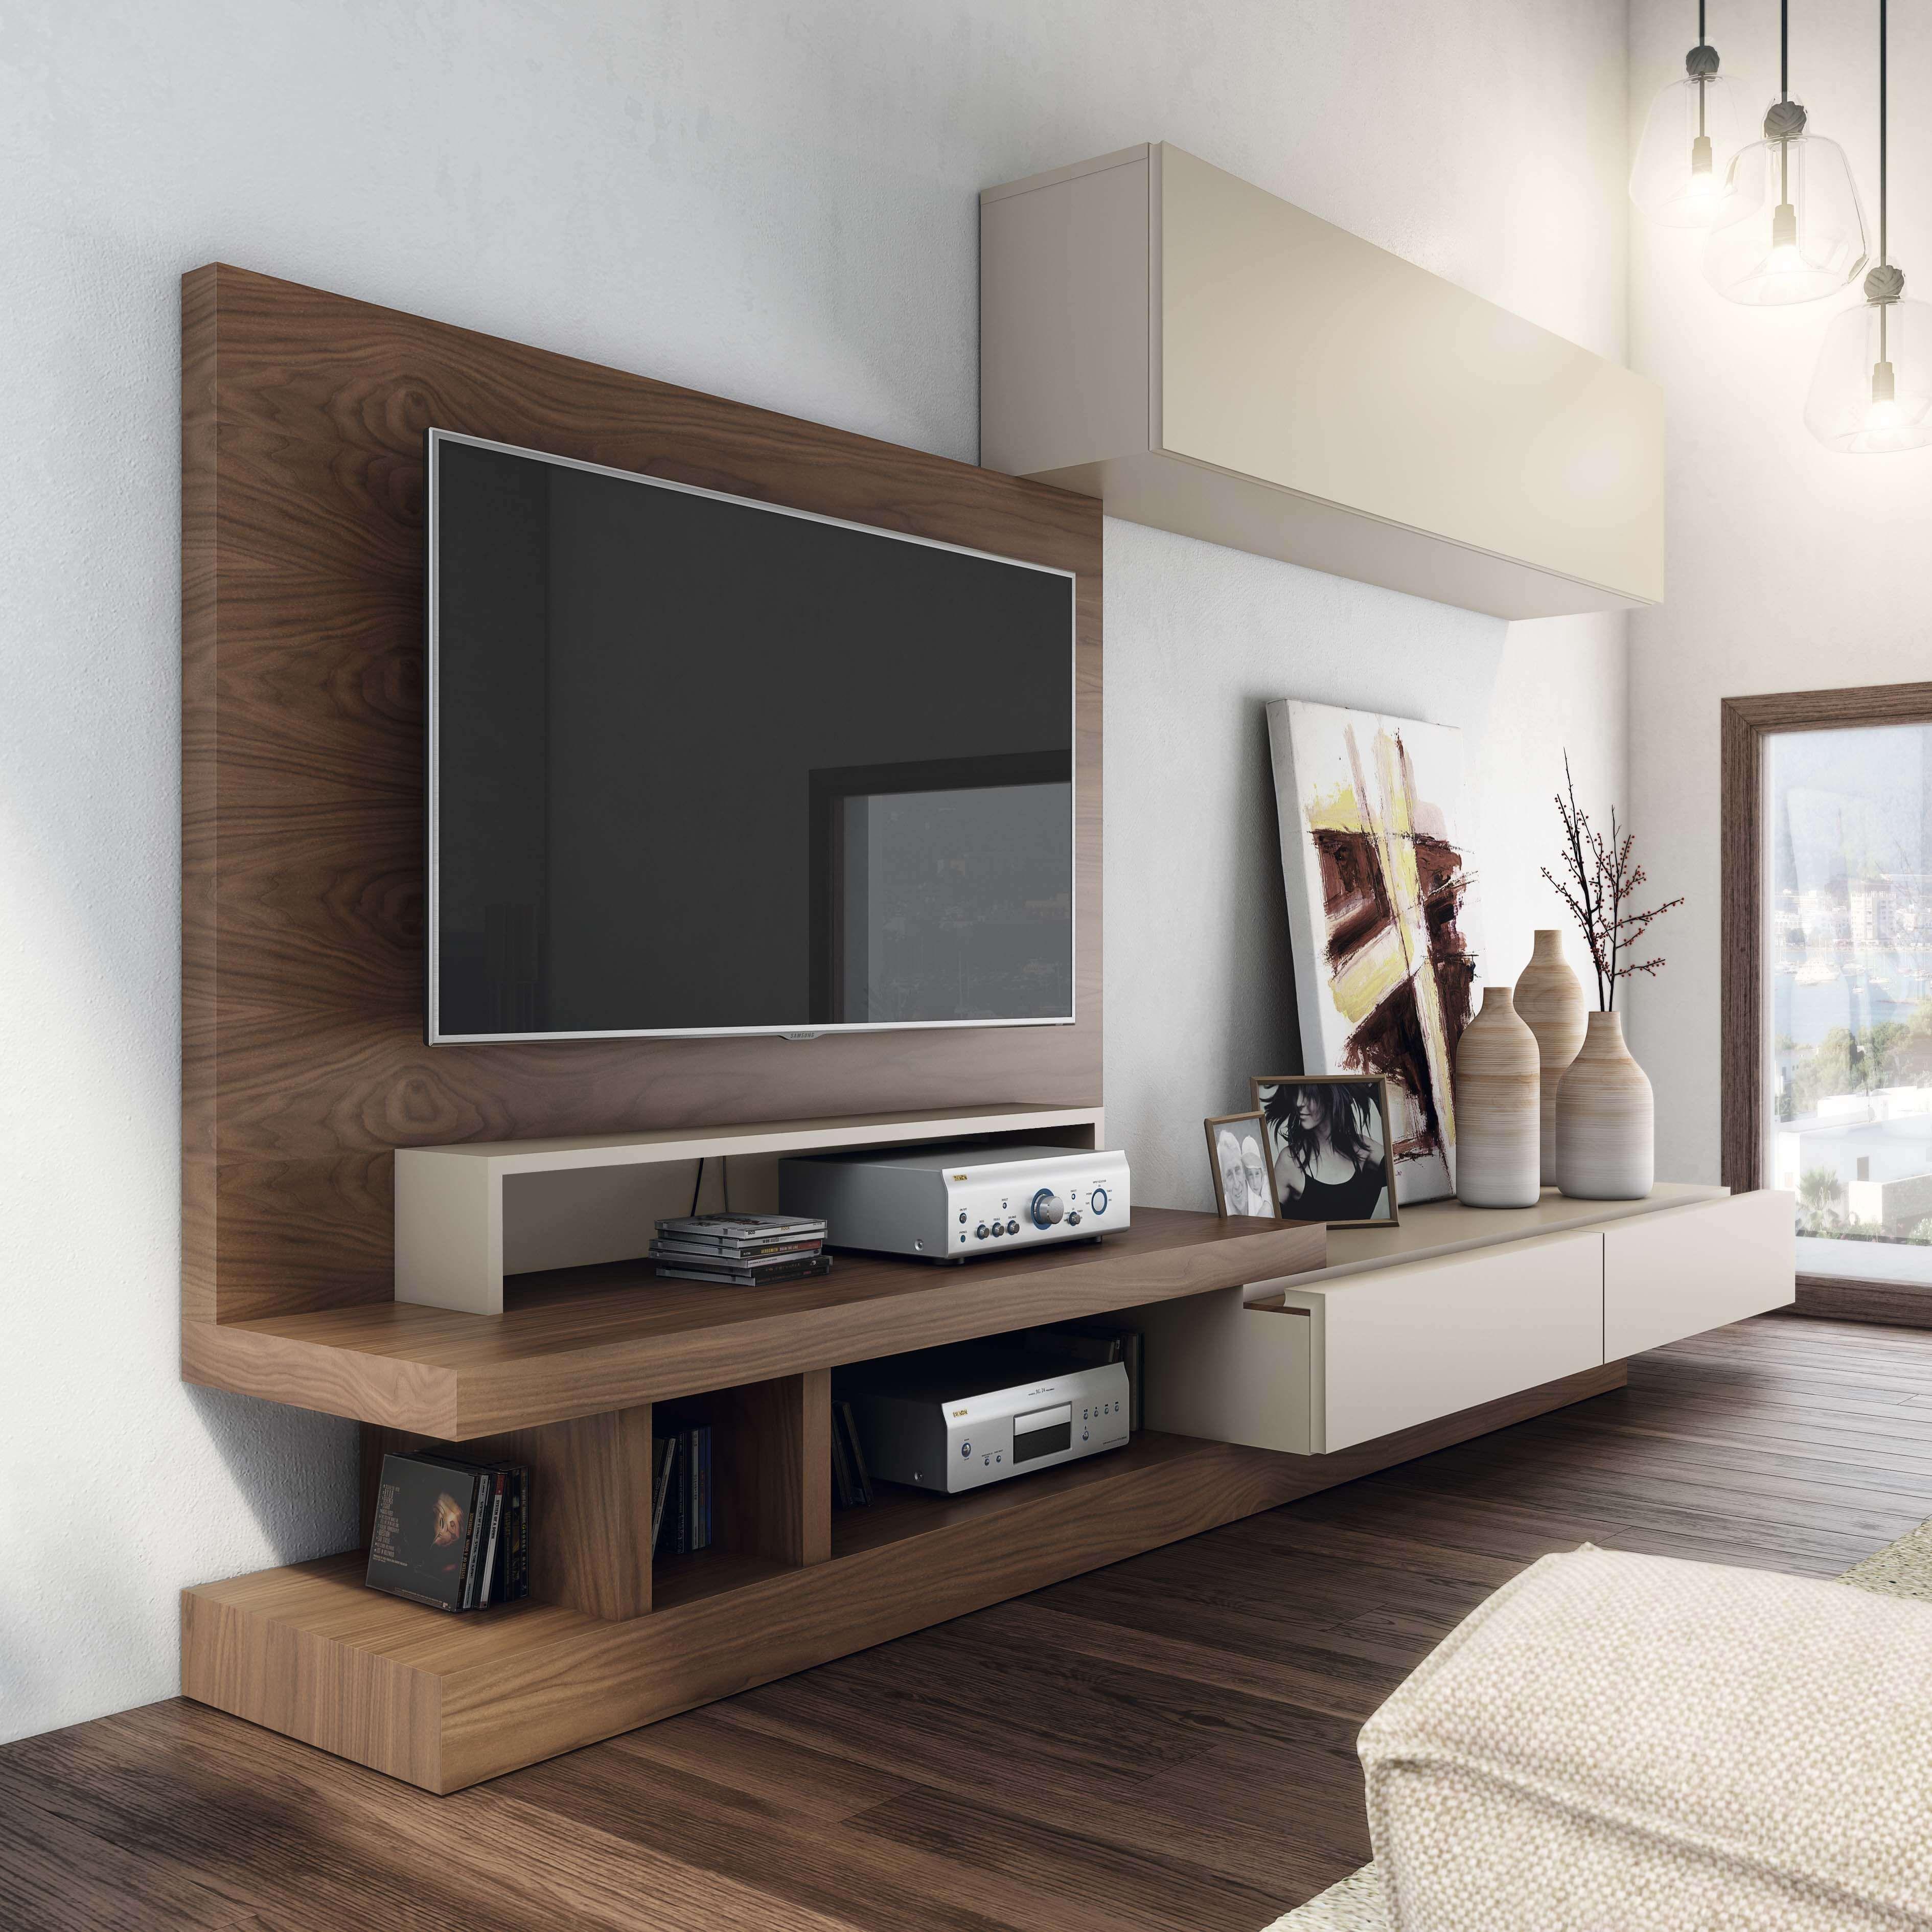 Epingle Sur Meuble Tv Design